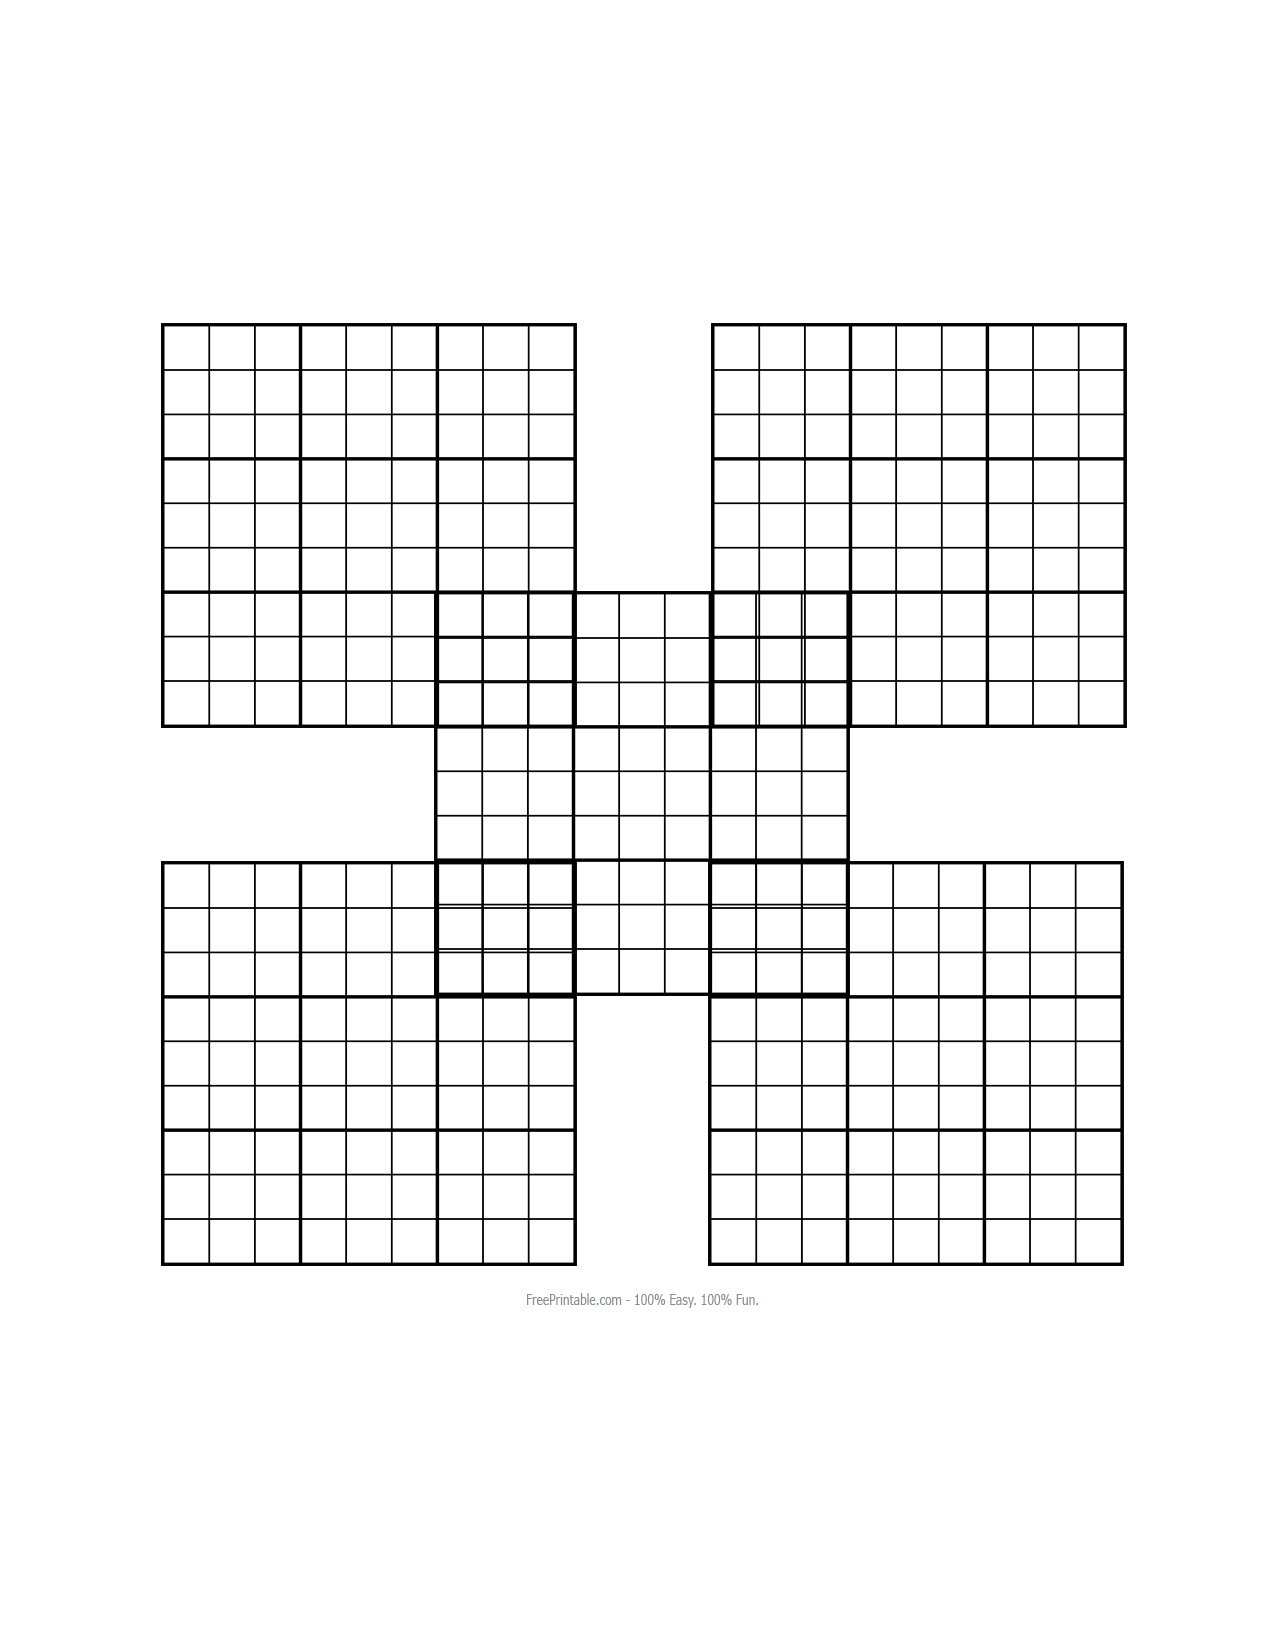 File Oceans Sudoku20 M3 Puzzleg